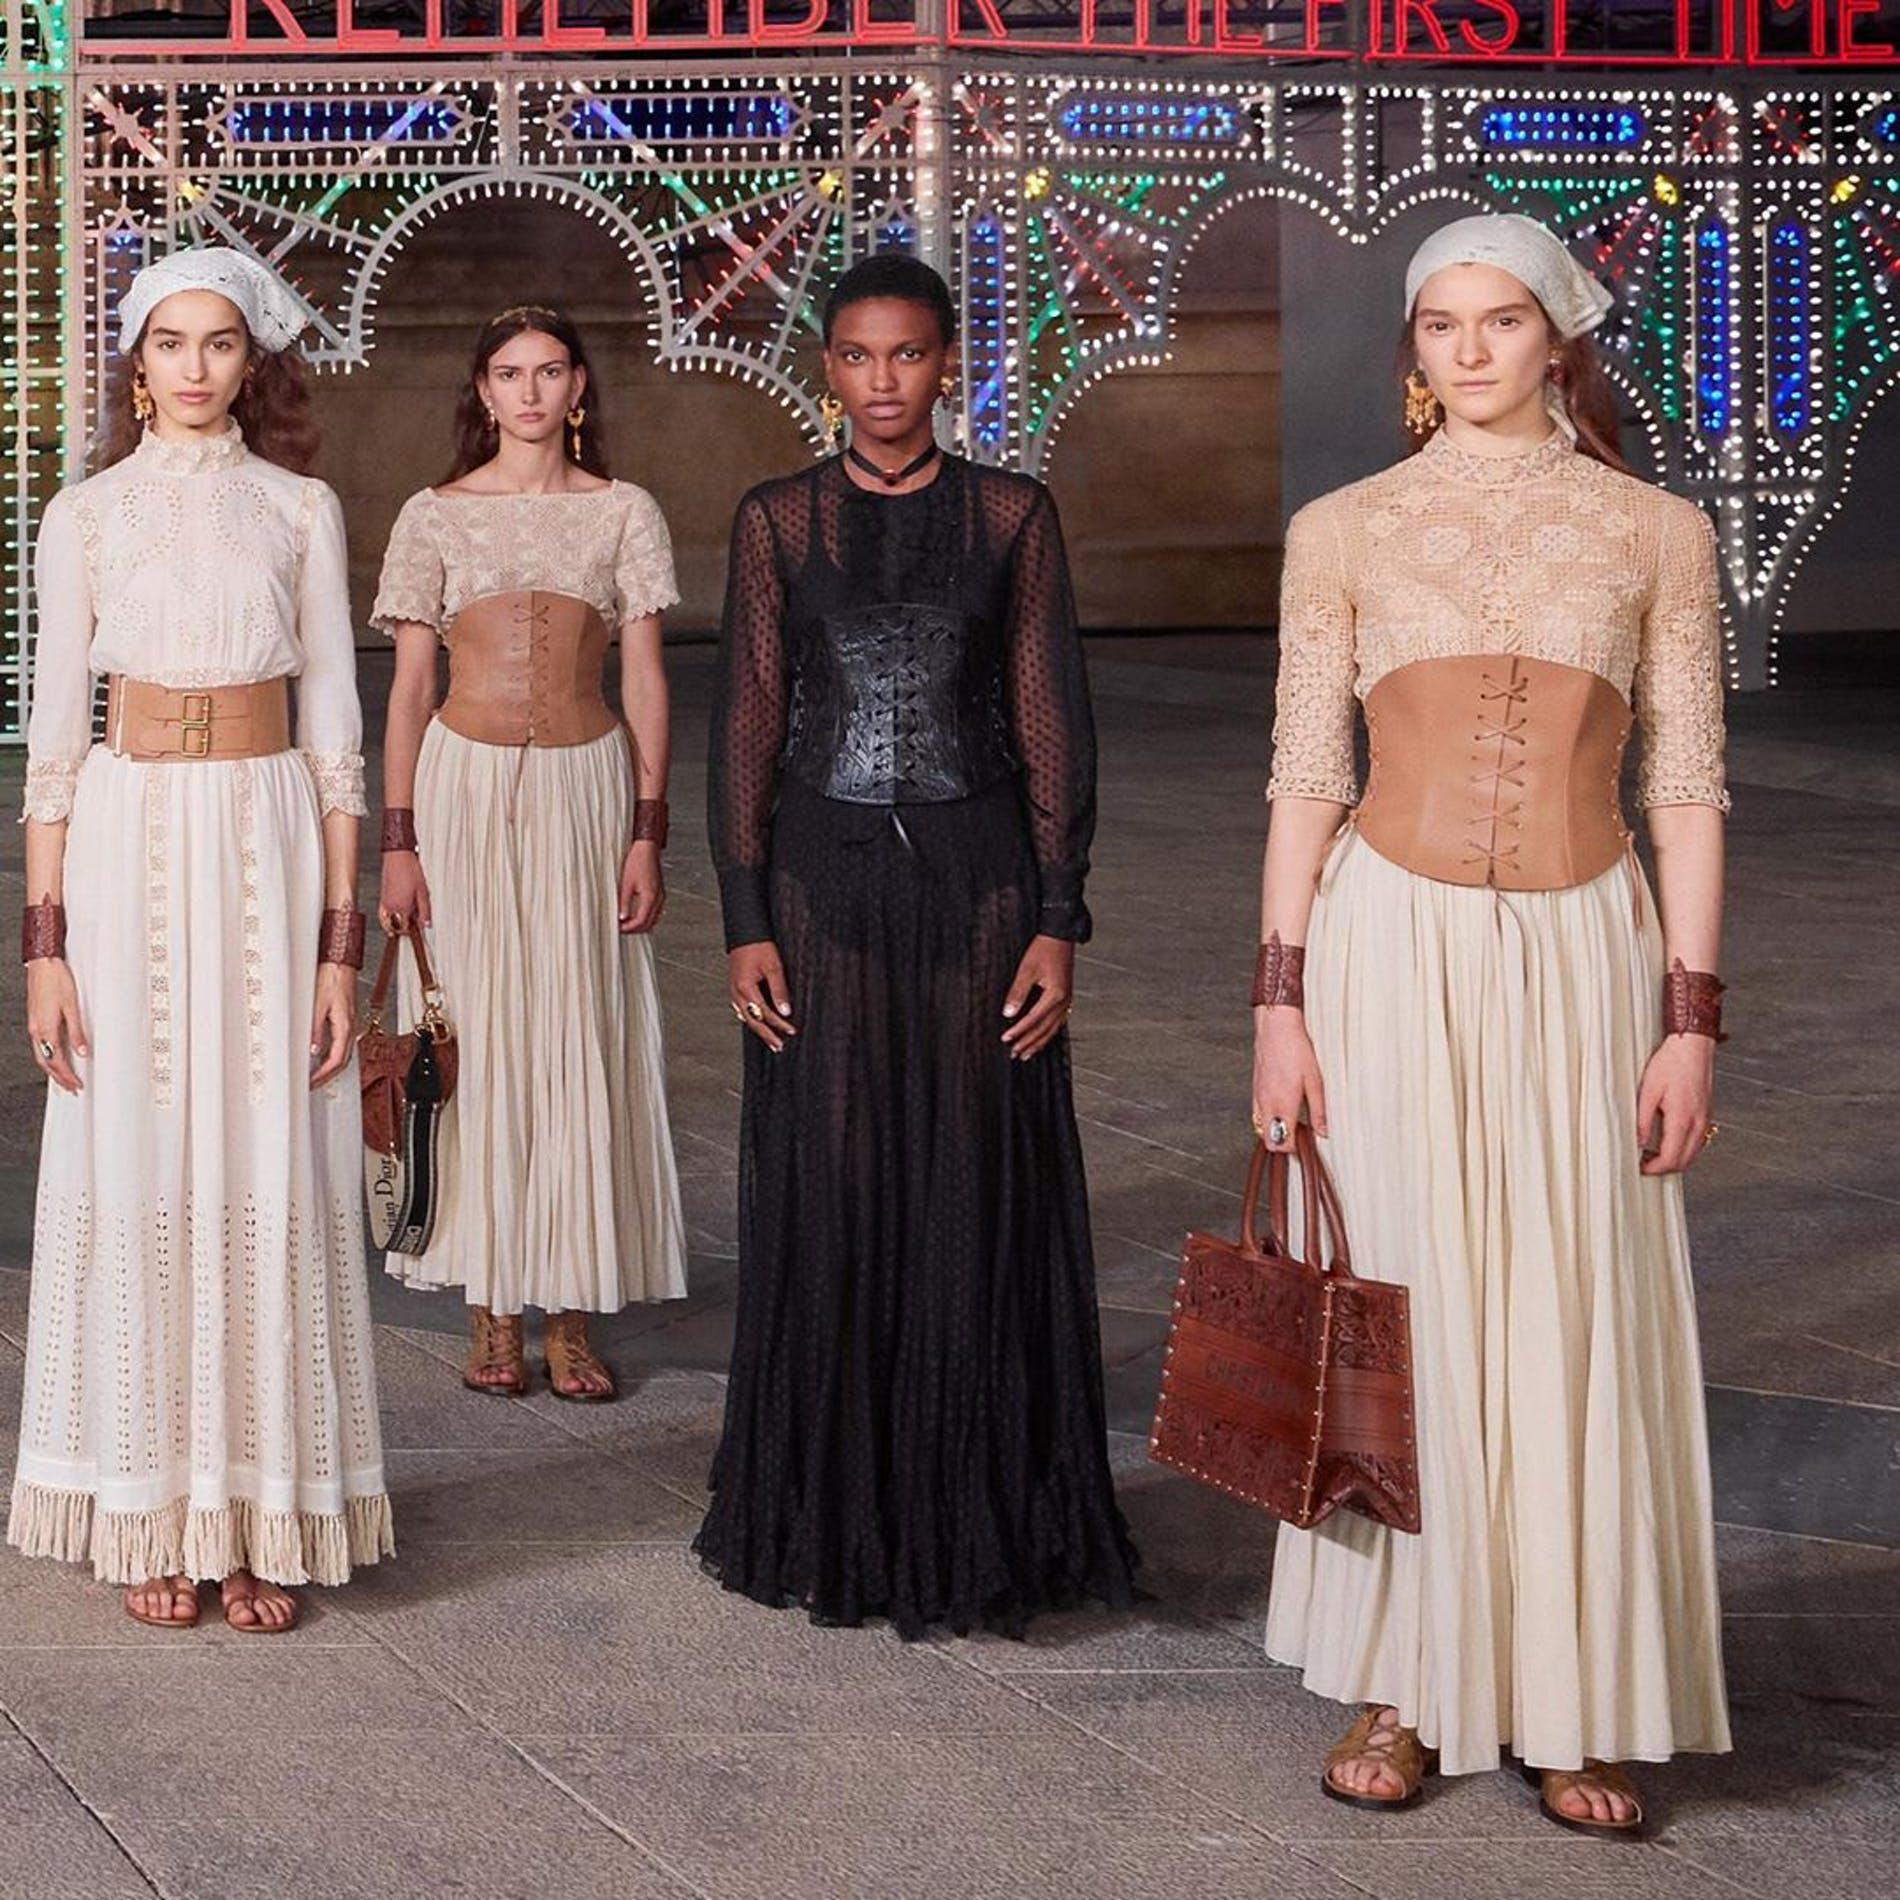 Dior Resort 2021 collection